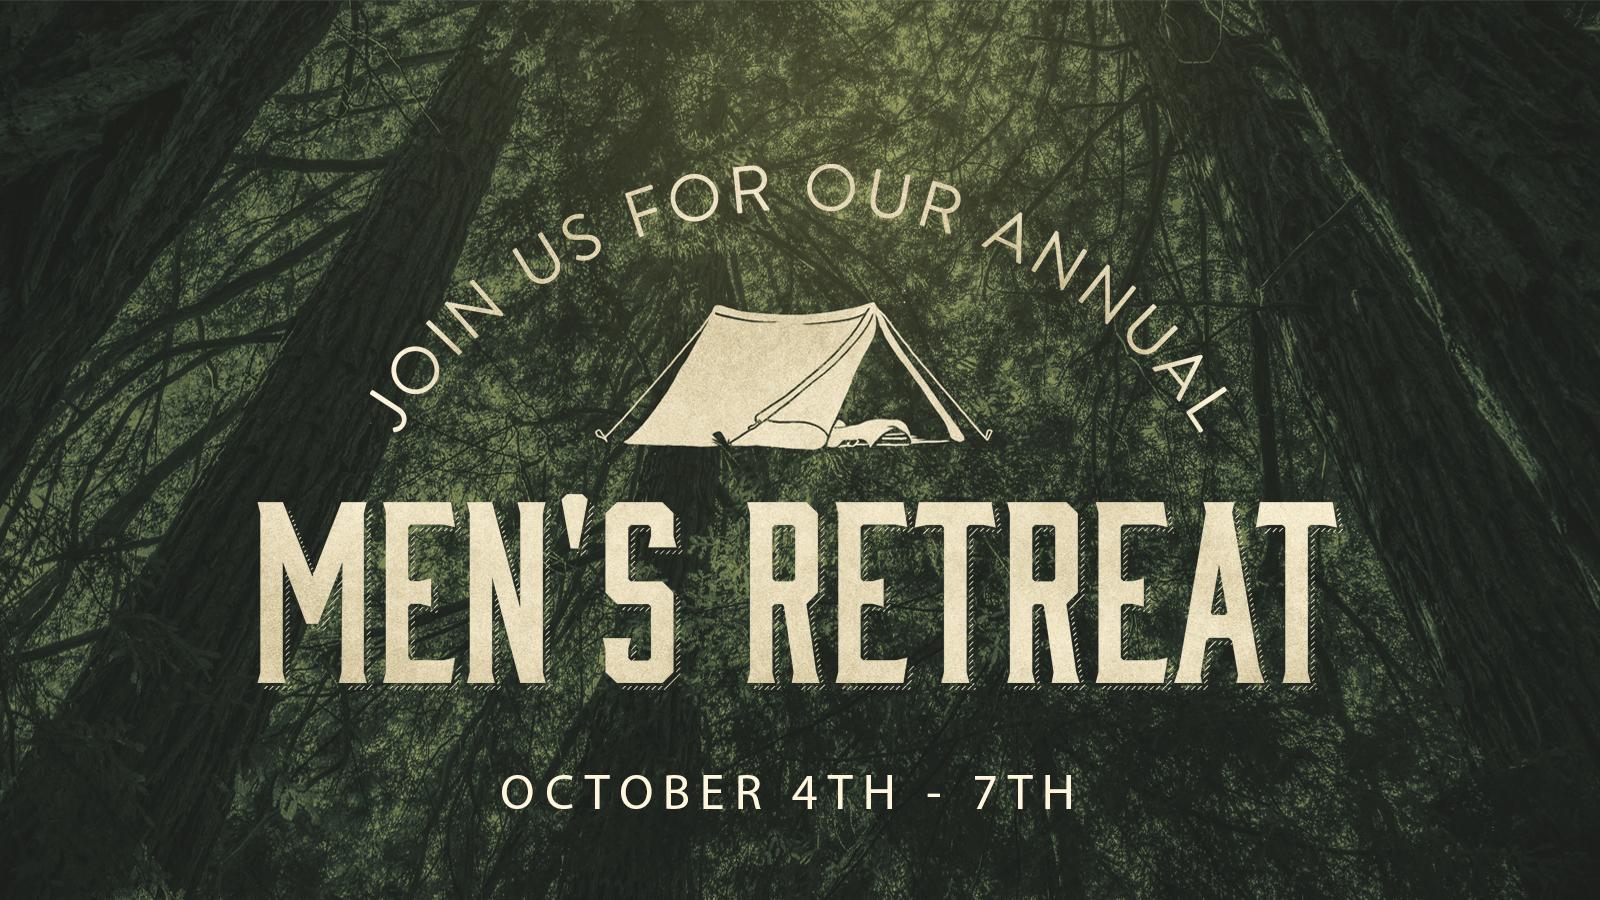 Mens retreat 2018 announce